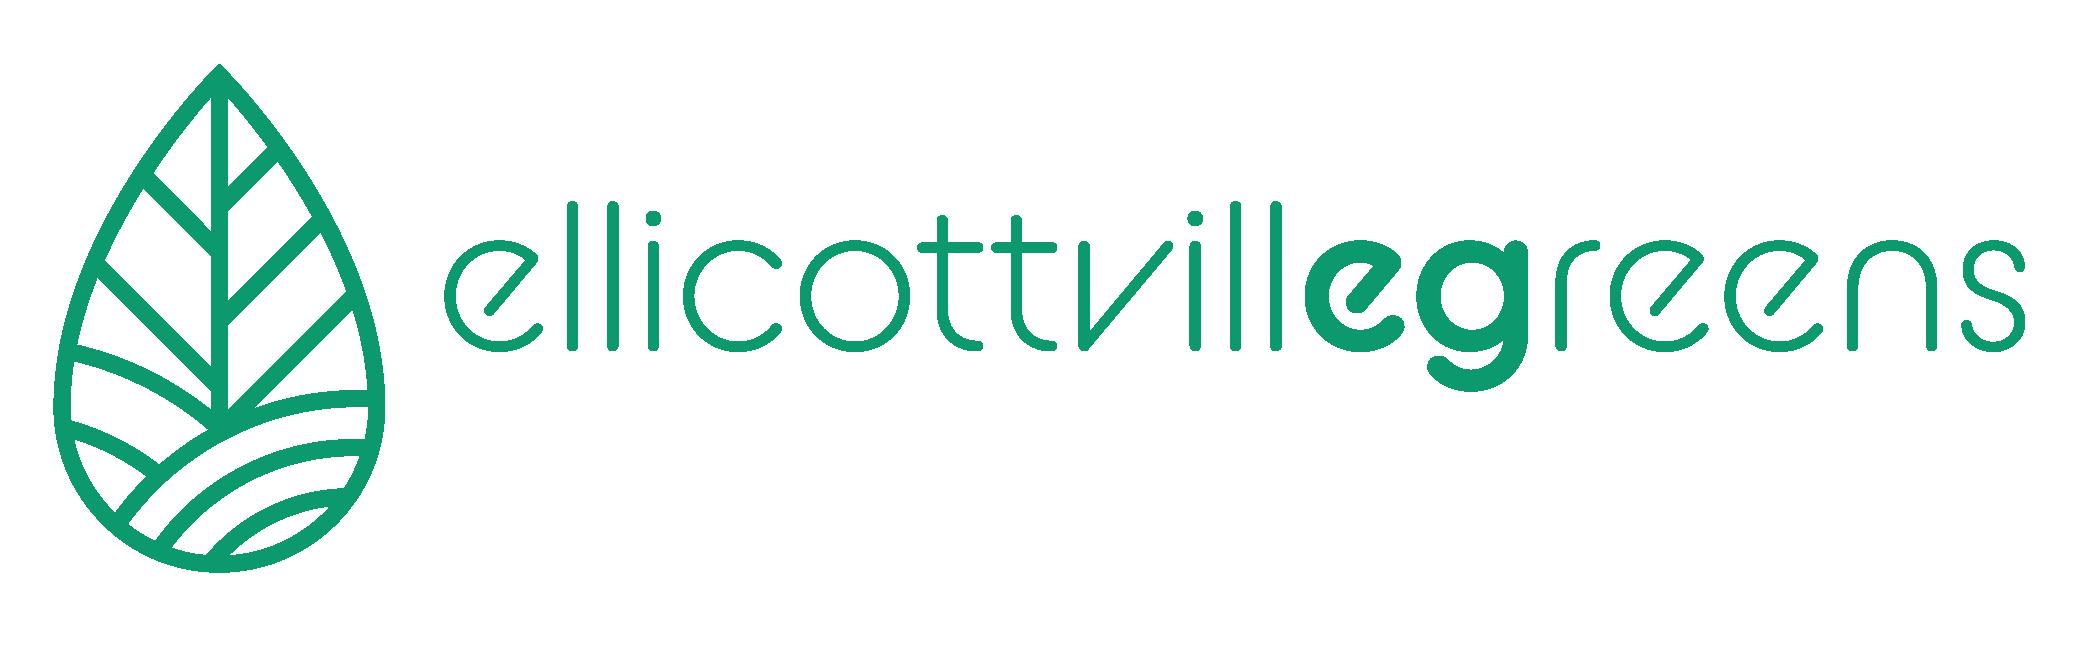 ellicotville-egreens-logo